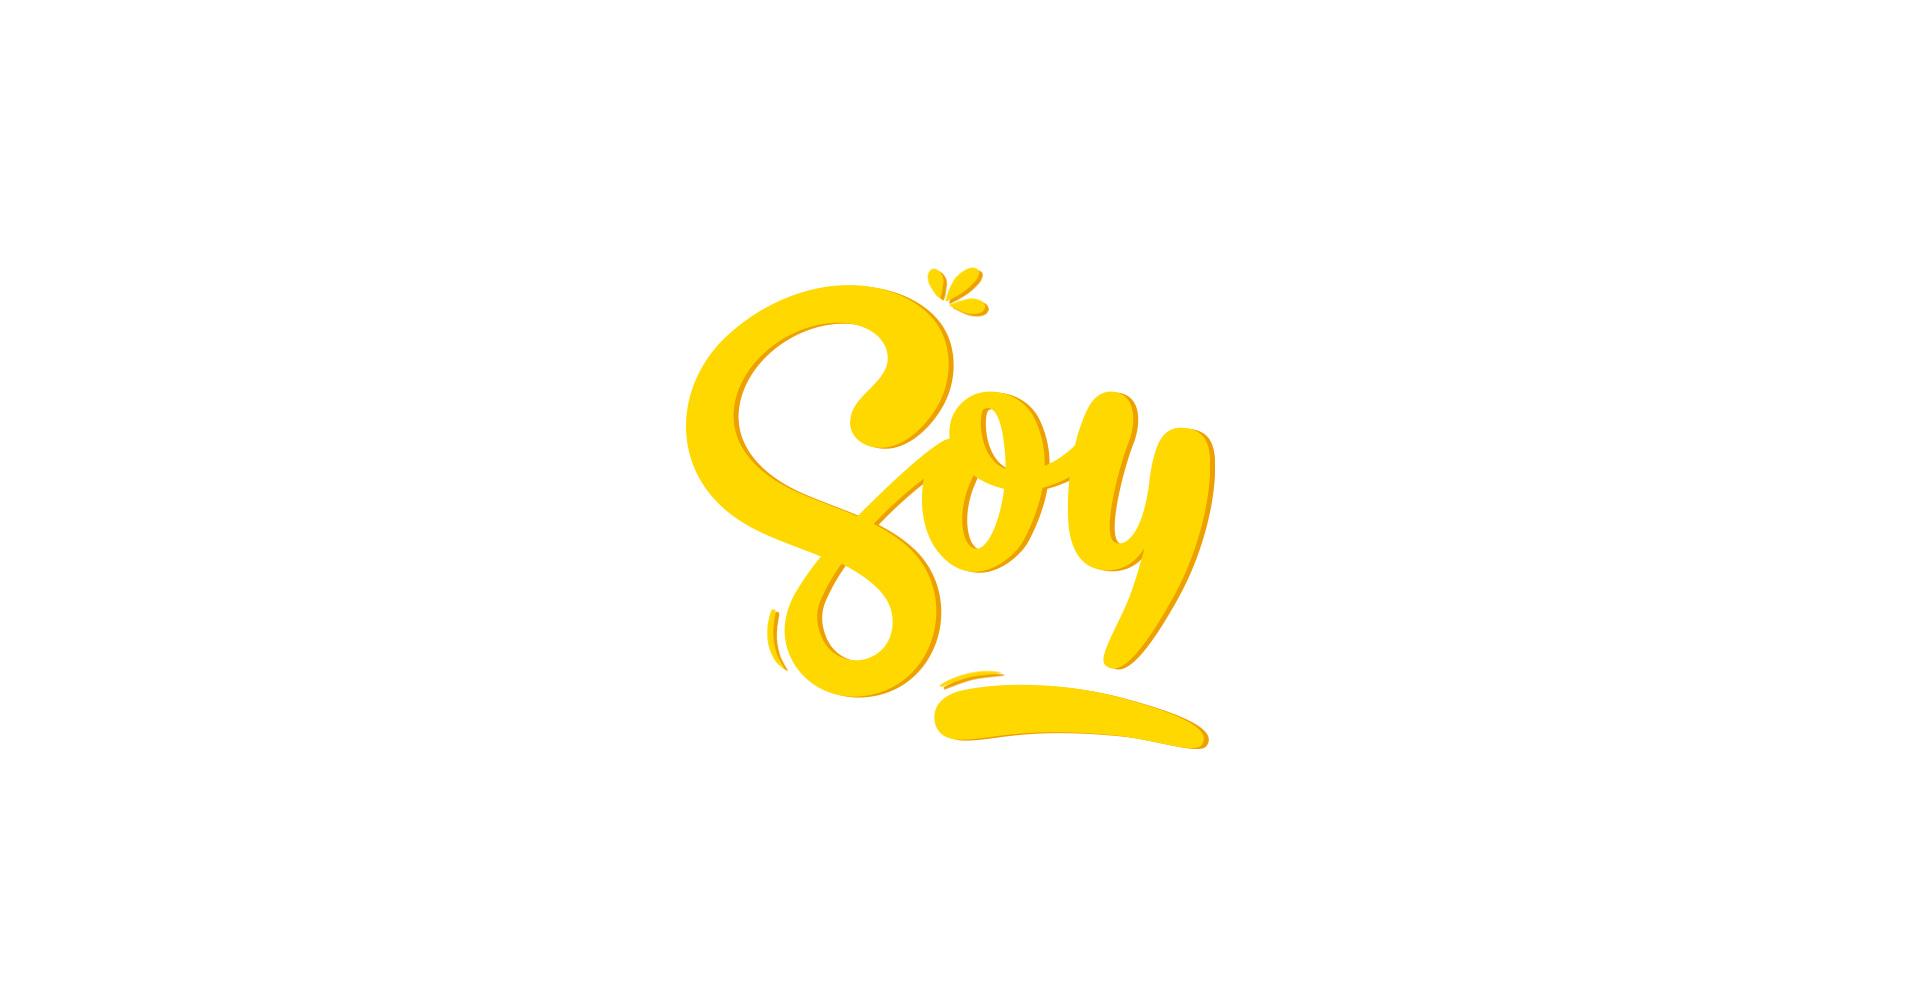 Soy image